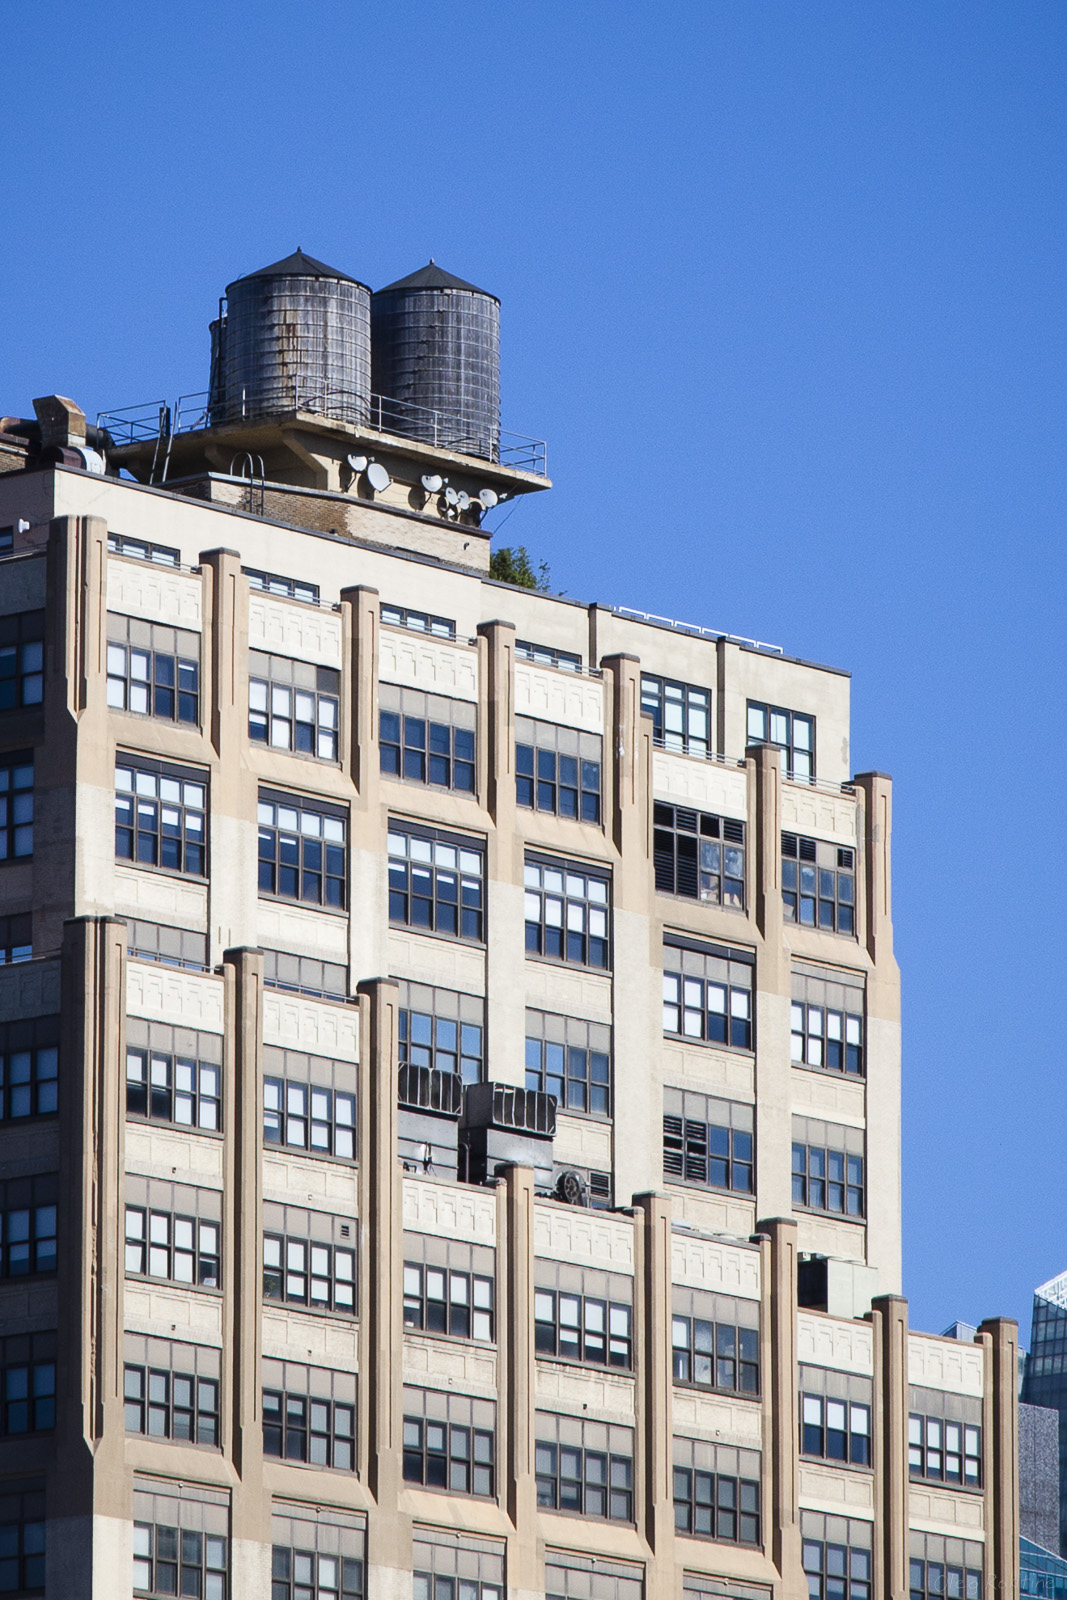 NYC2014-039.jpg